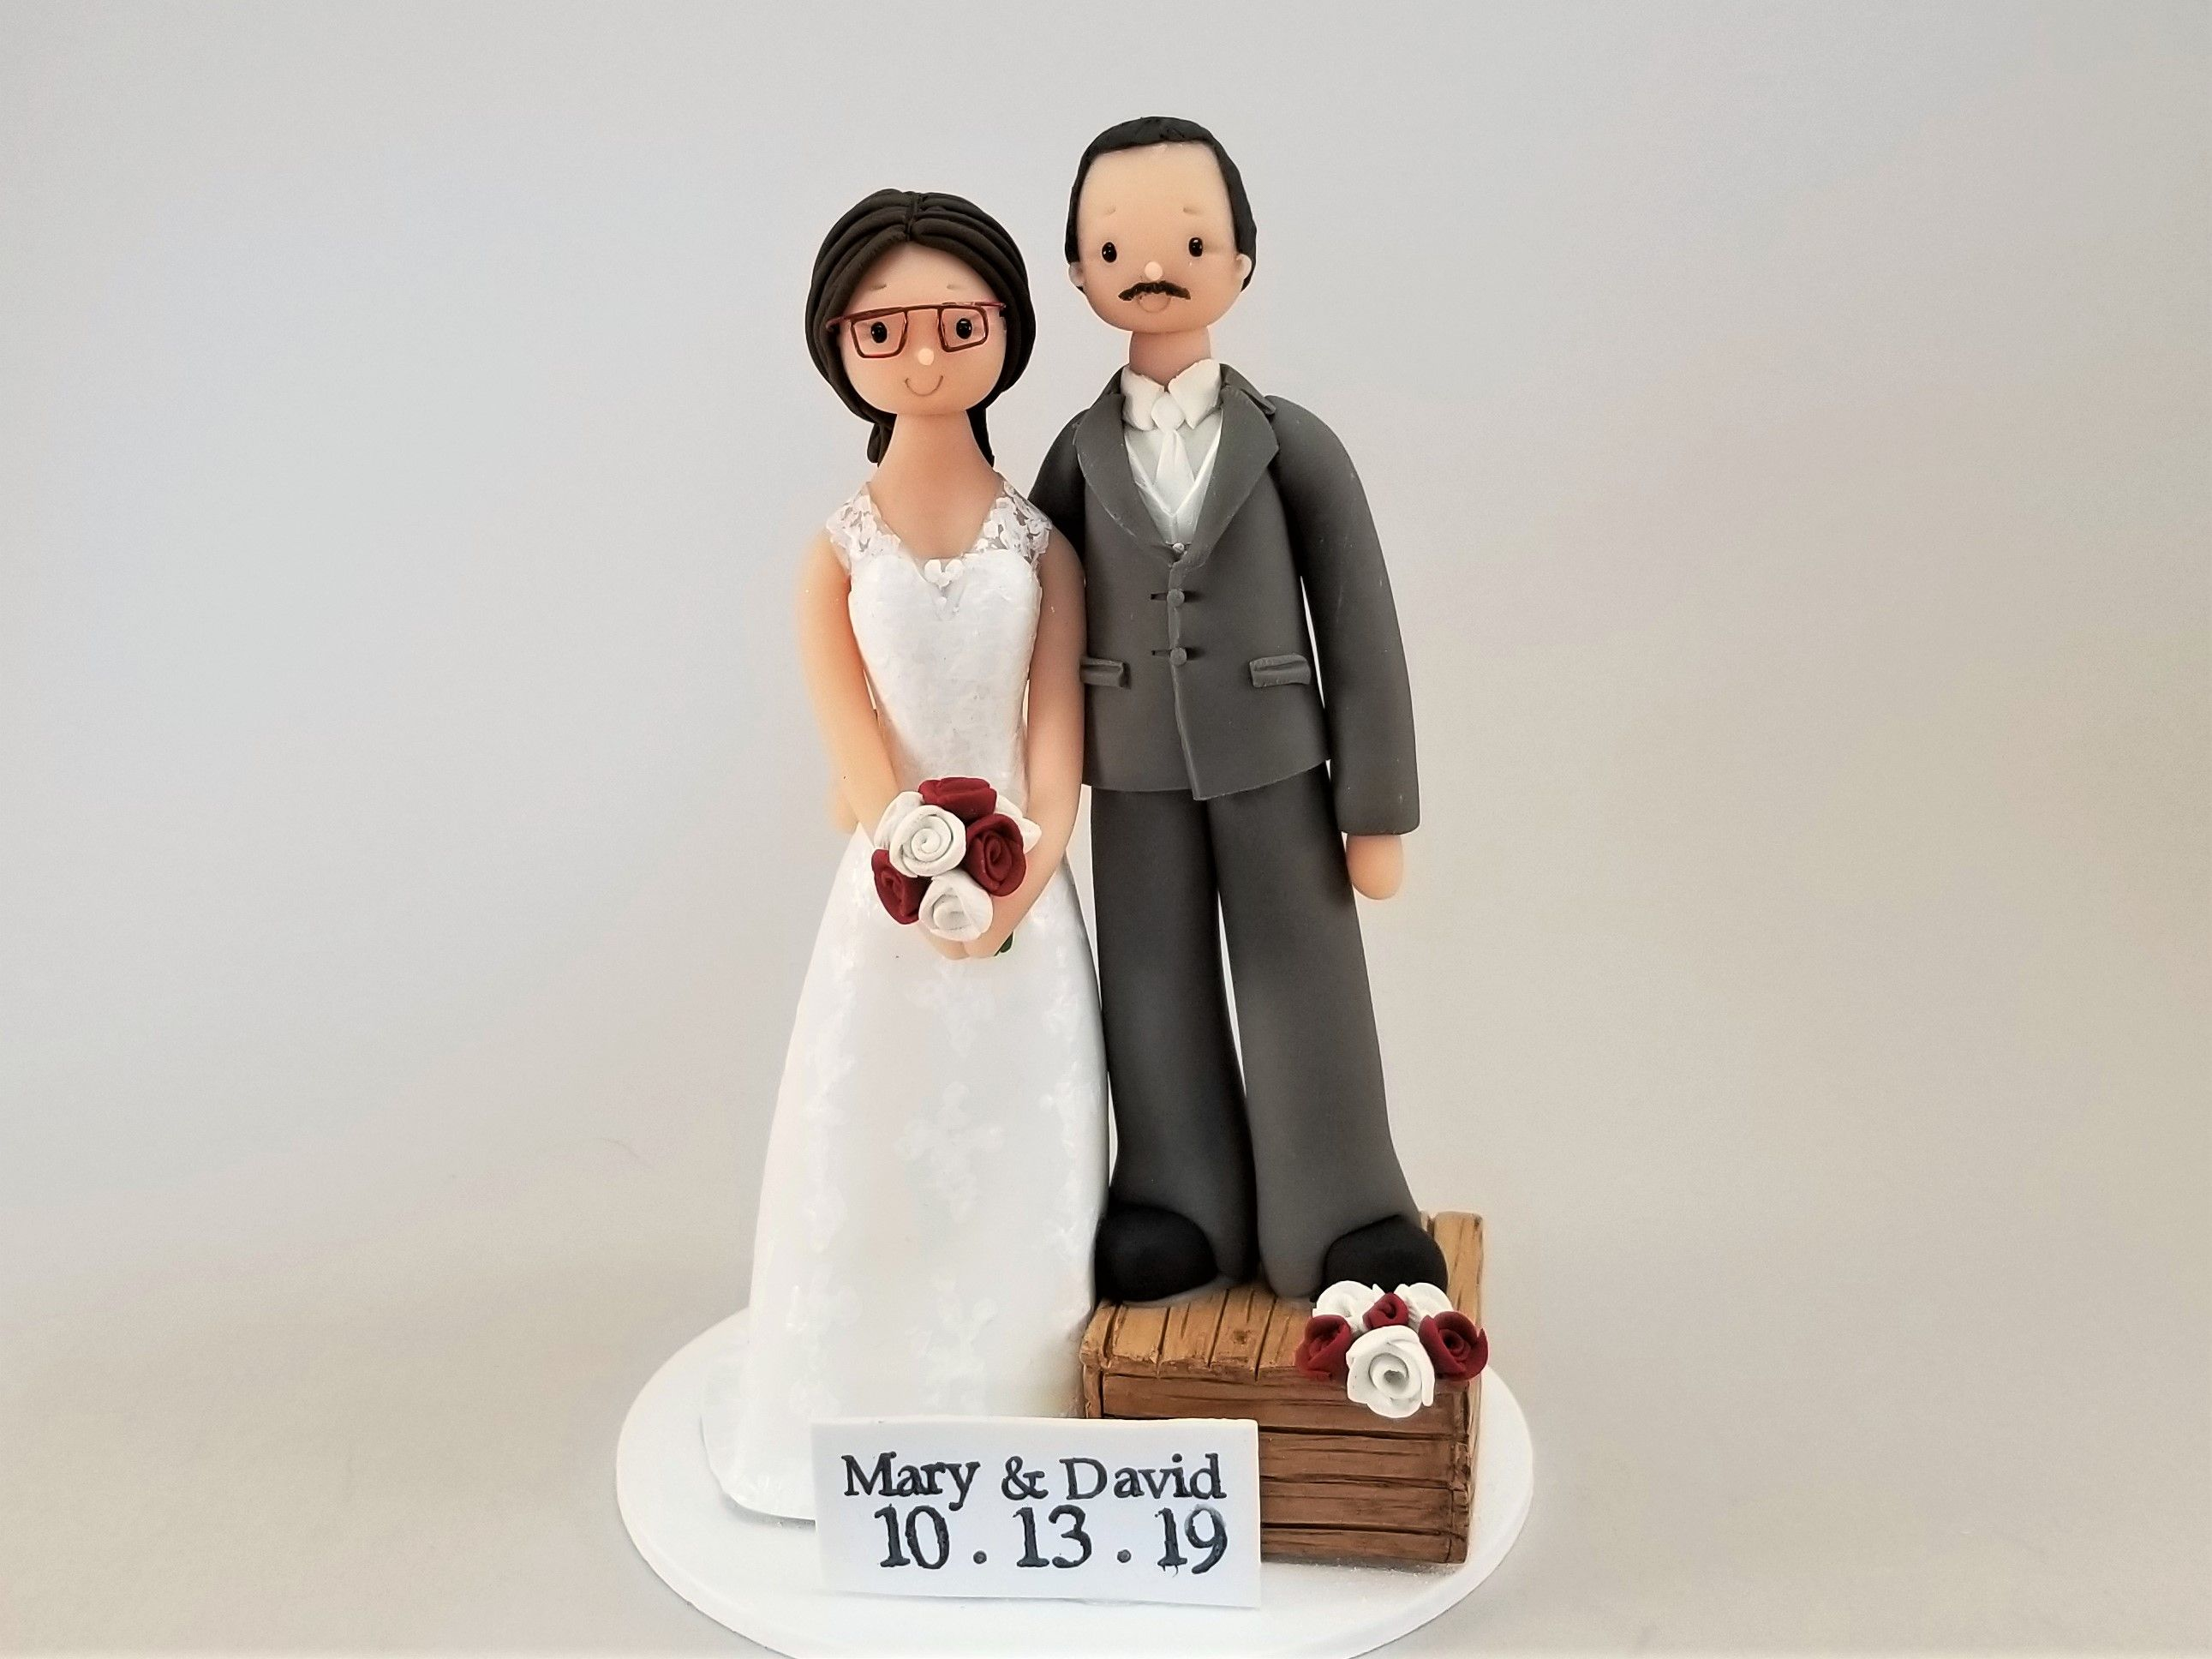 Short Groom Tall Bride Wedding Cake Topper Customized By Mudcards Wedding Cake Toppers Wedding Bride Funny Wedding Cake Toppers